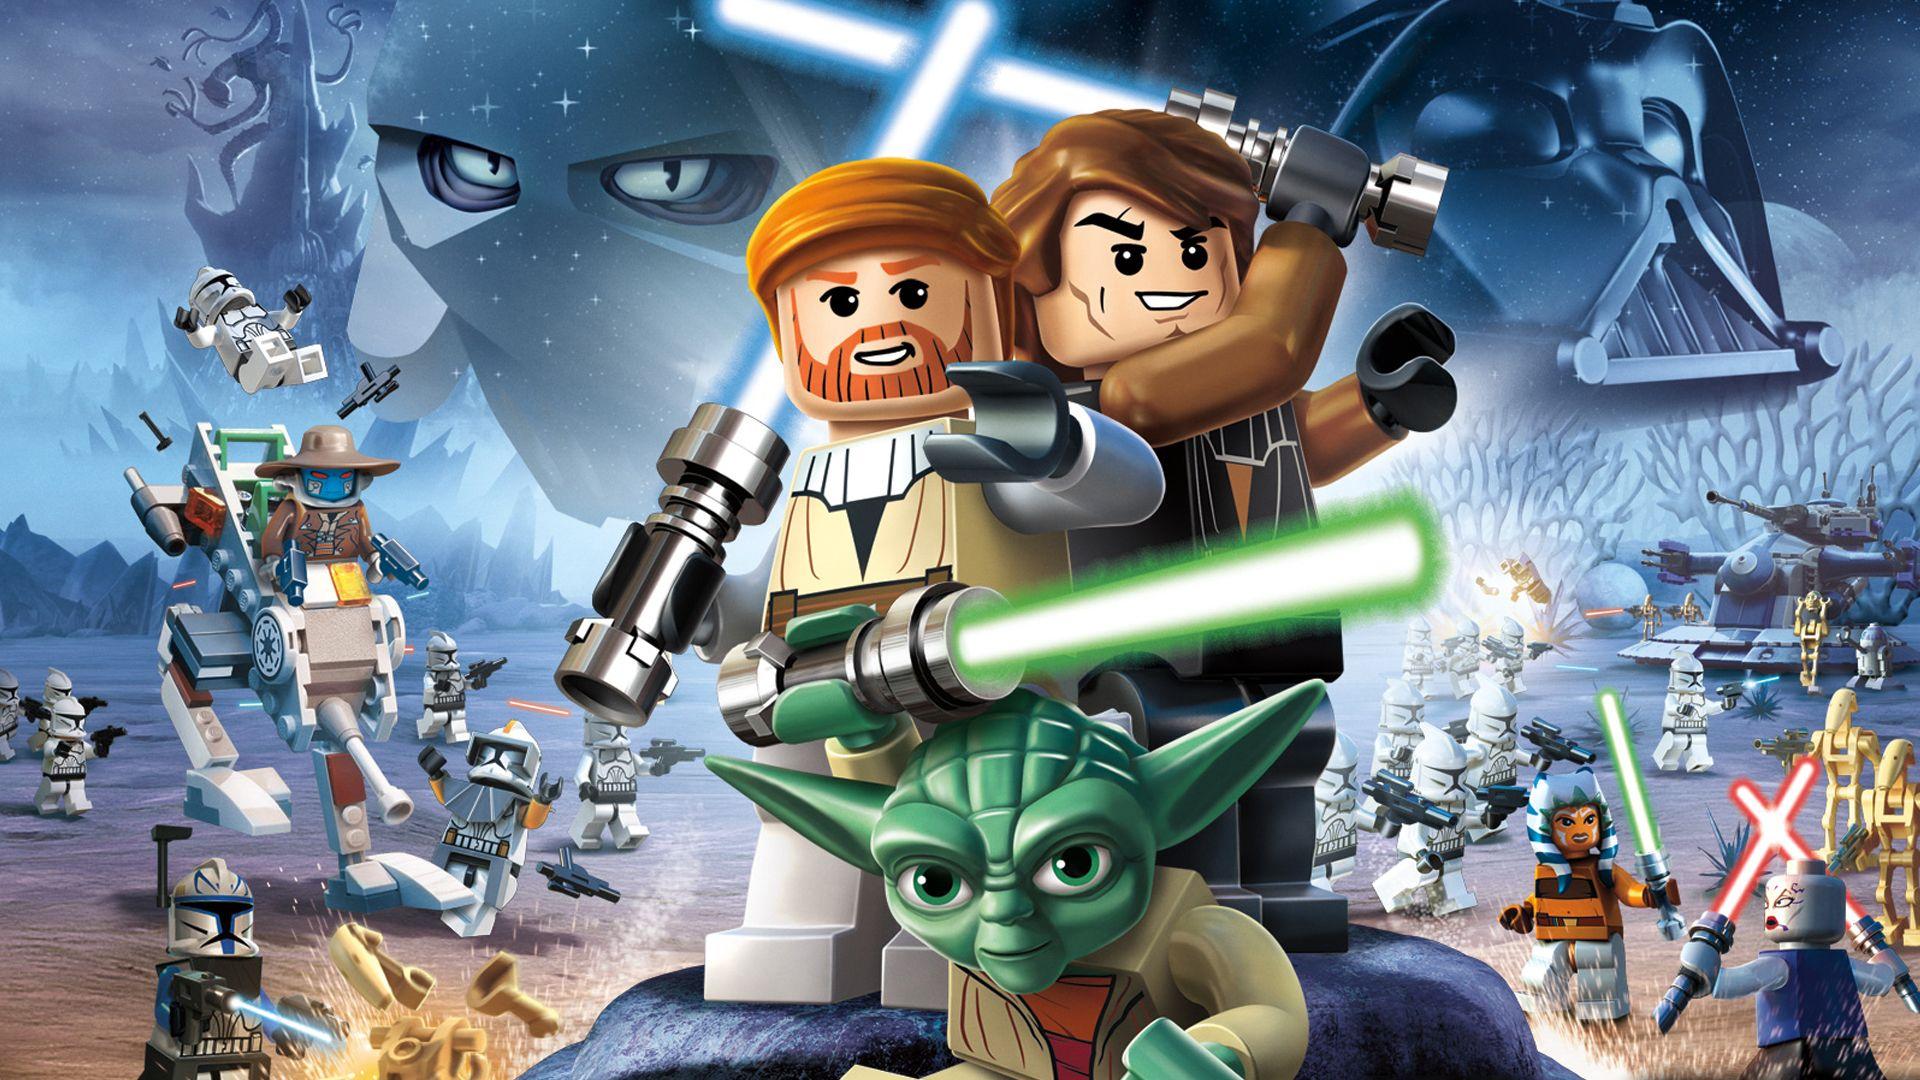 31 Lego Star Wars Iii The Clone Wars Wallpapers On Wallpapersafari